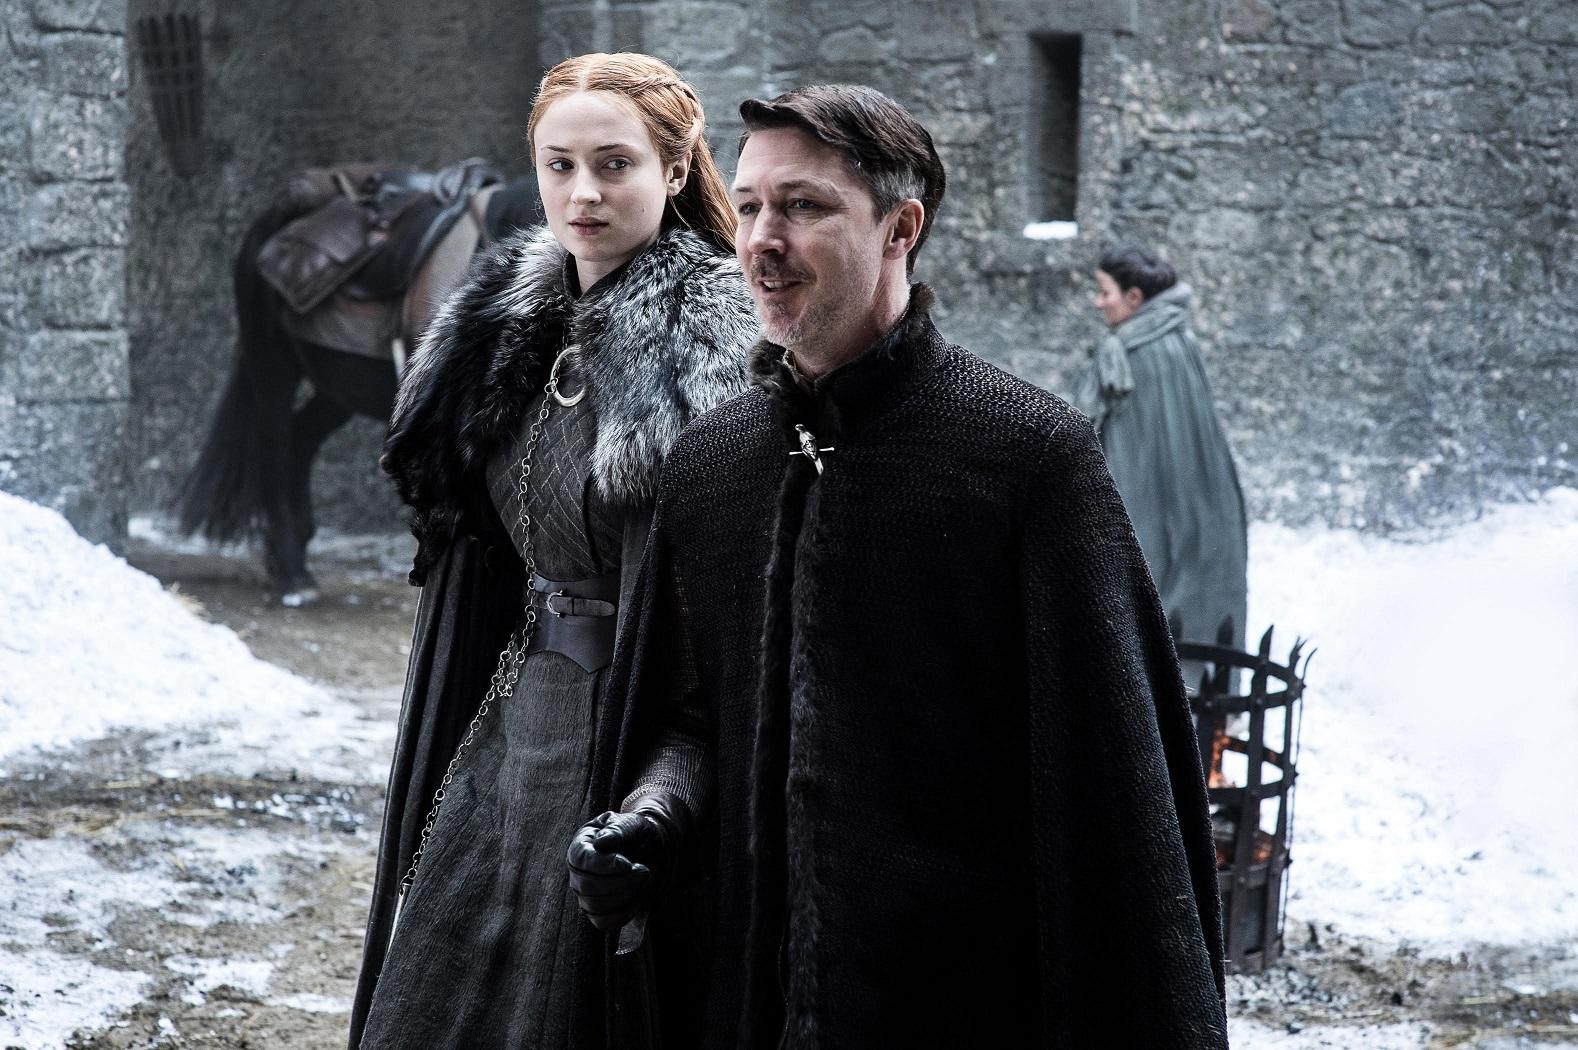 Sophie Turner as Sansa Stark and Aidan Gillen as Petyr Baelish. Photo: HBO